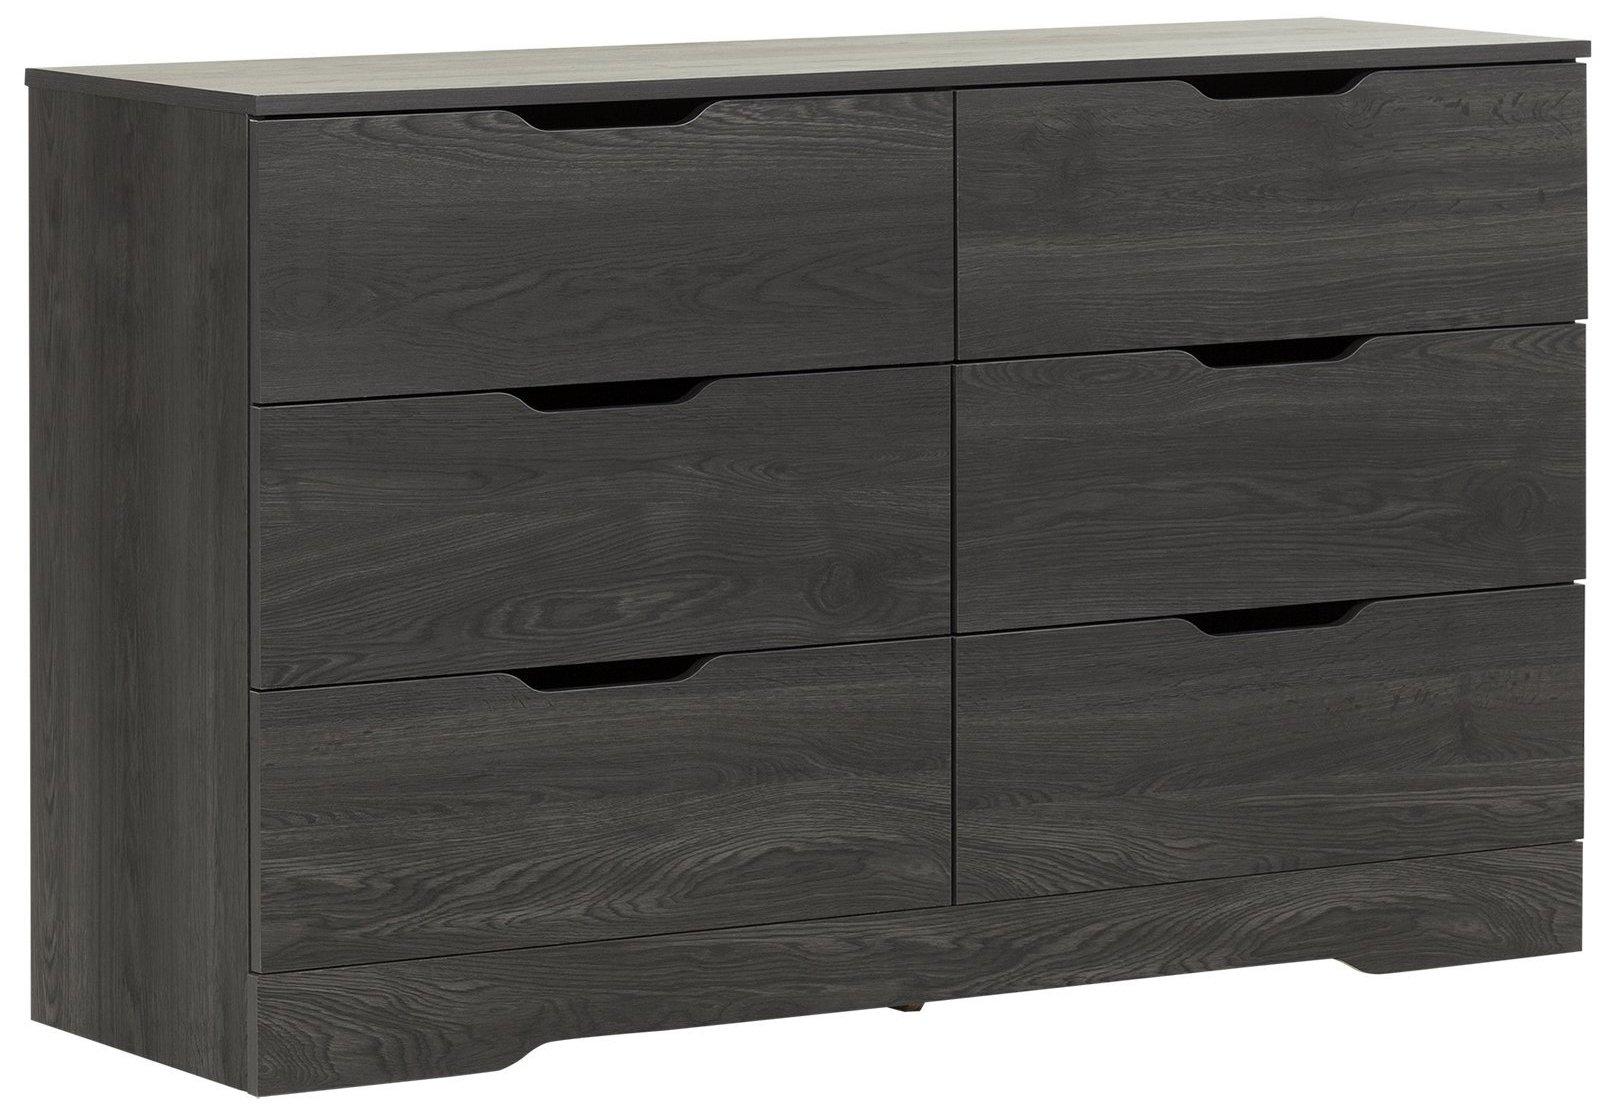 South Shore Holland 6-Drawer Double Dresser, Gray Oak